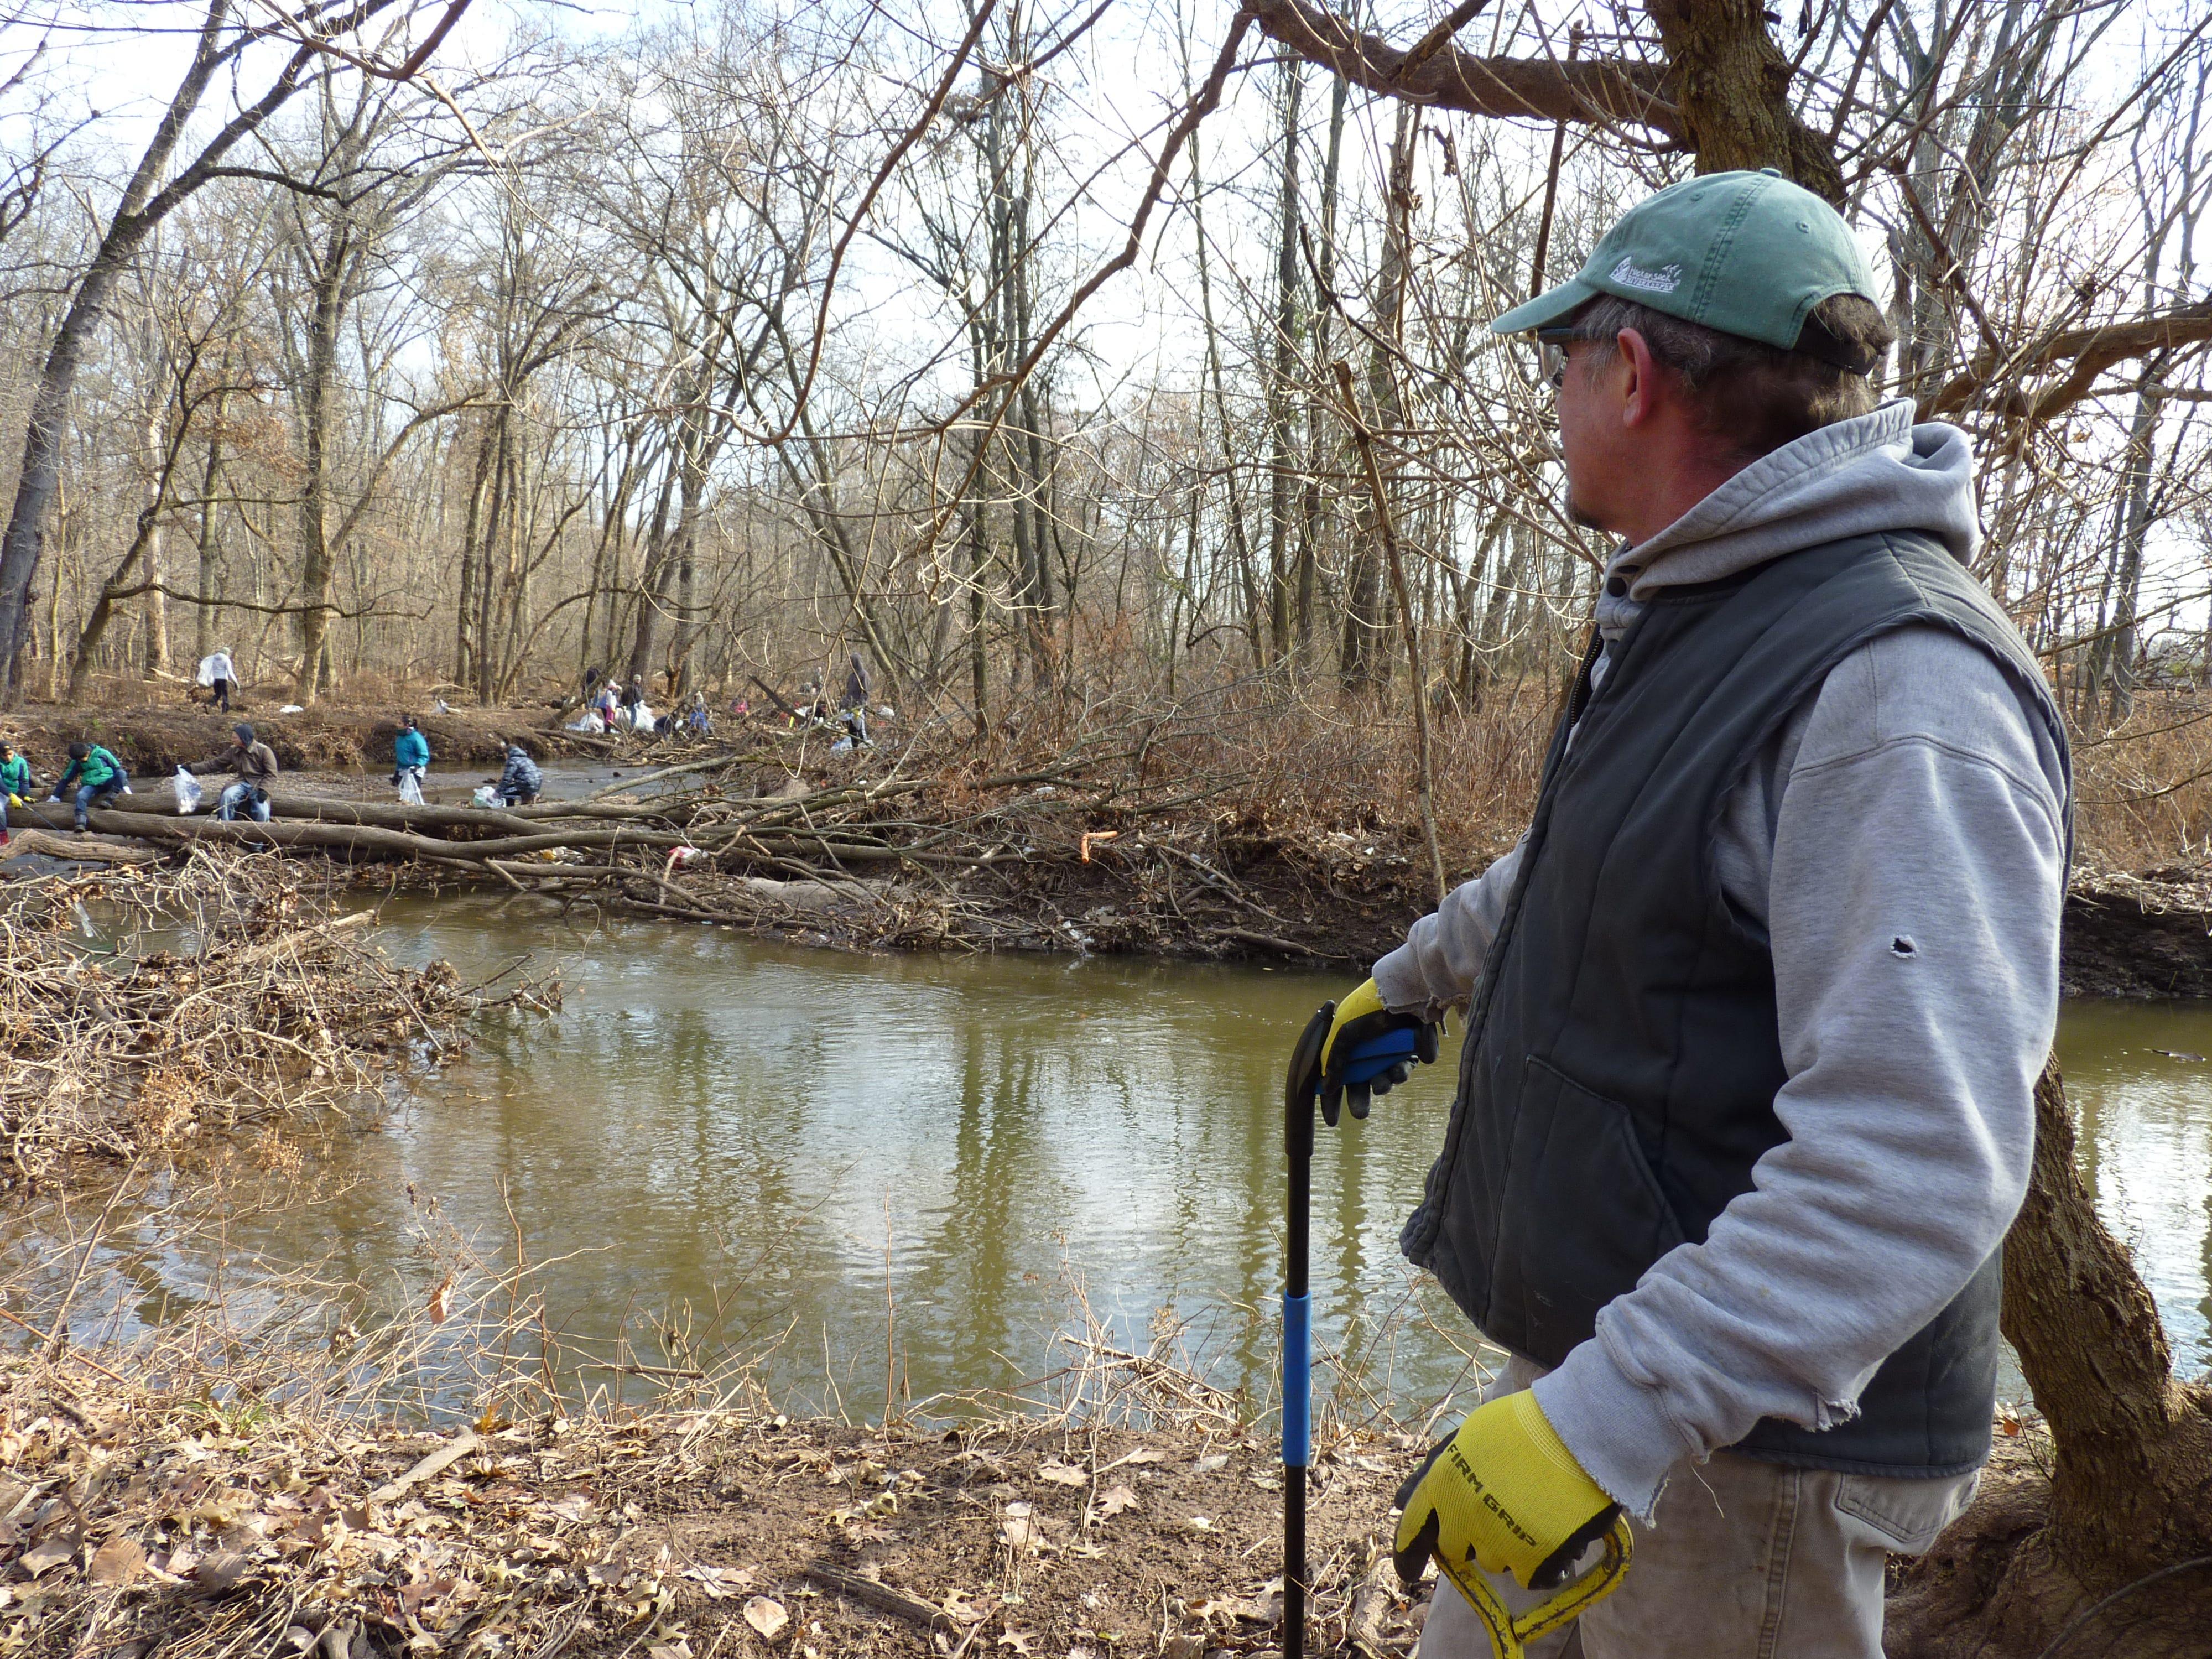 Rob Gillies, board president of Hackensack Riverkeeper, in Green Brook on Dec. 8, 2018.